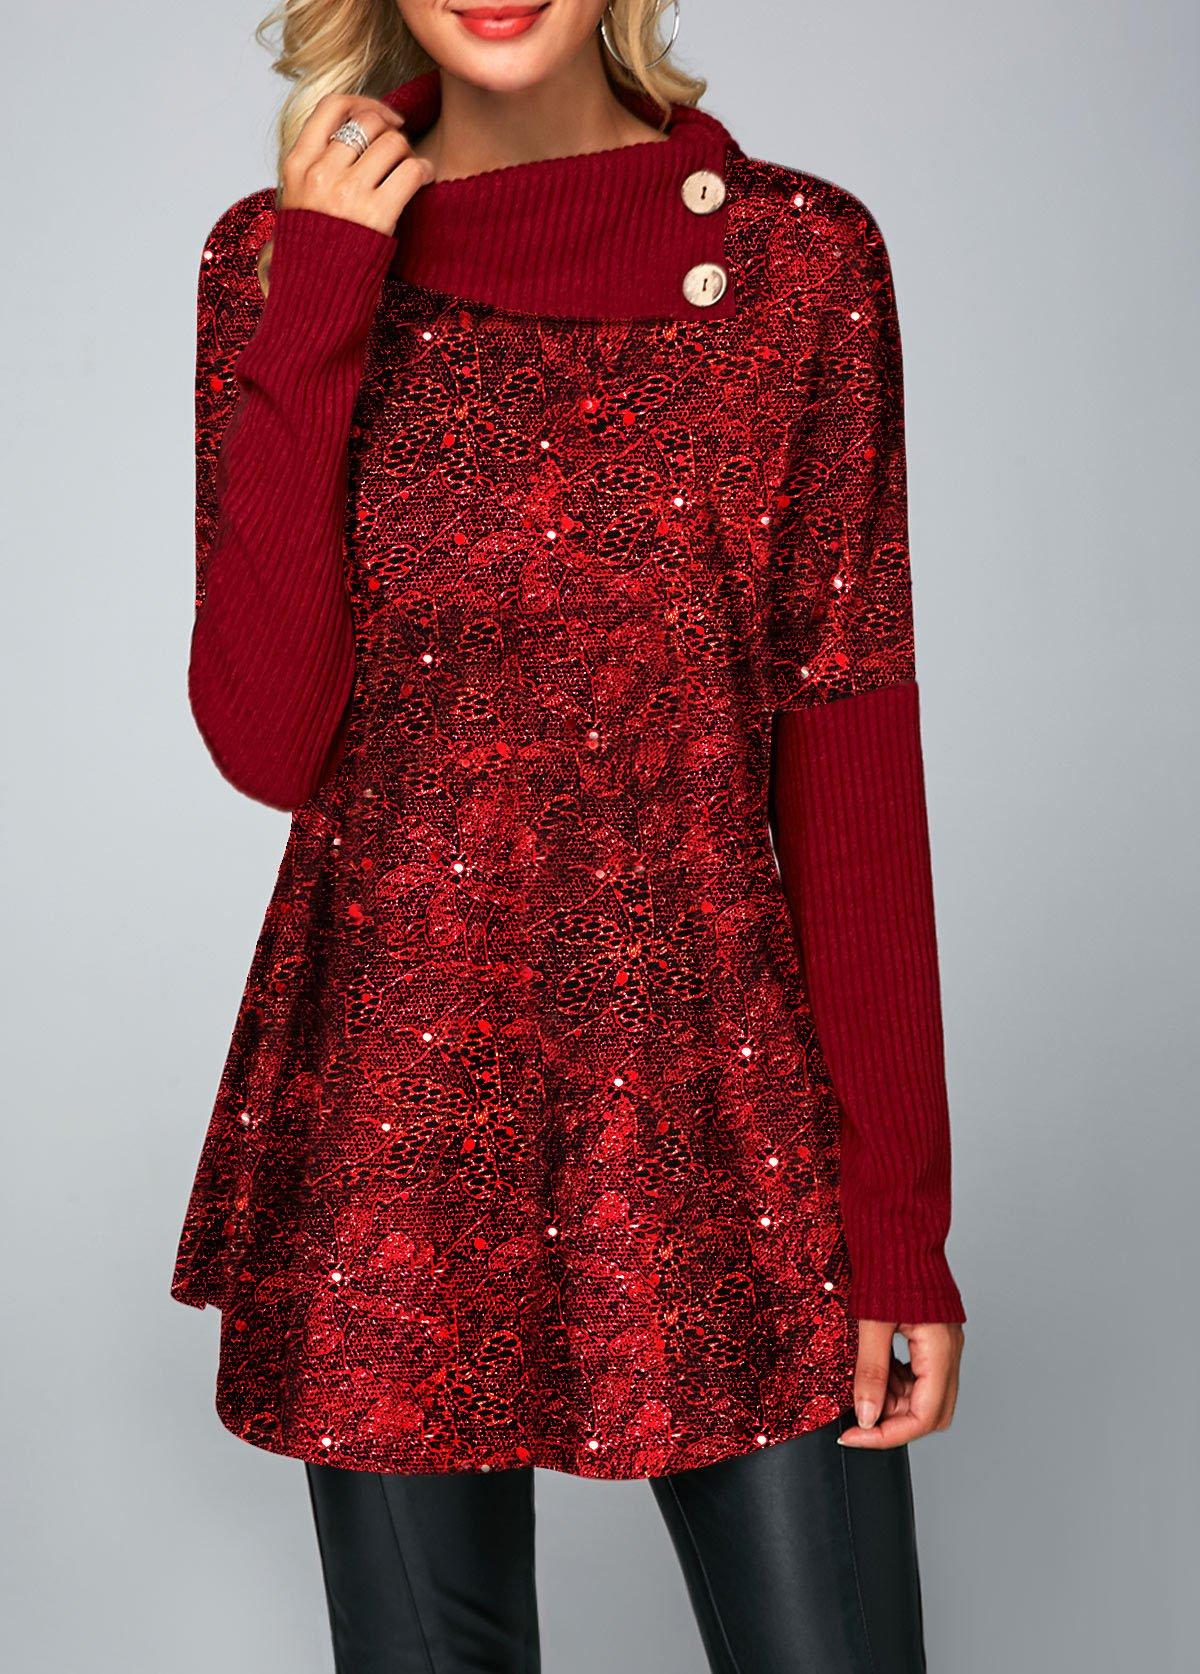 Wine Red Button Detail Long Sleeve Shining T Shirt